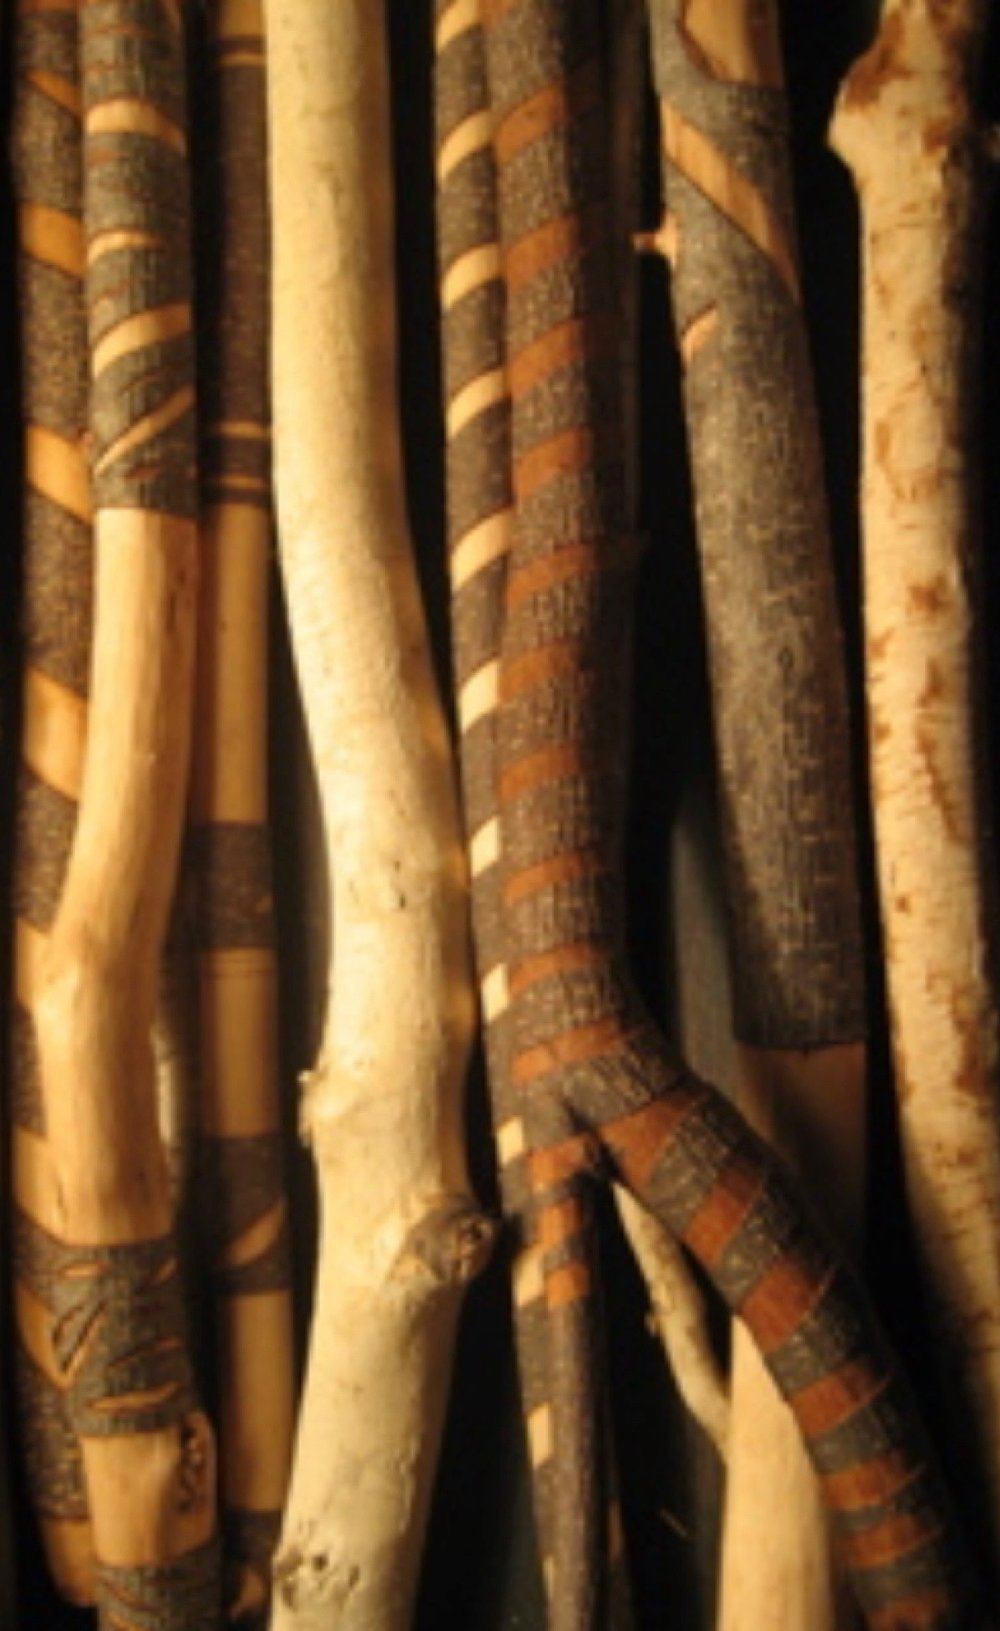 carved-sticks 2.jpg